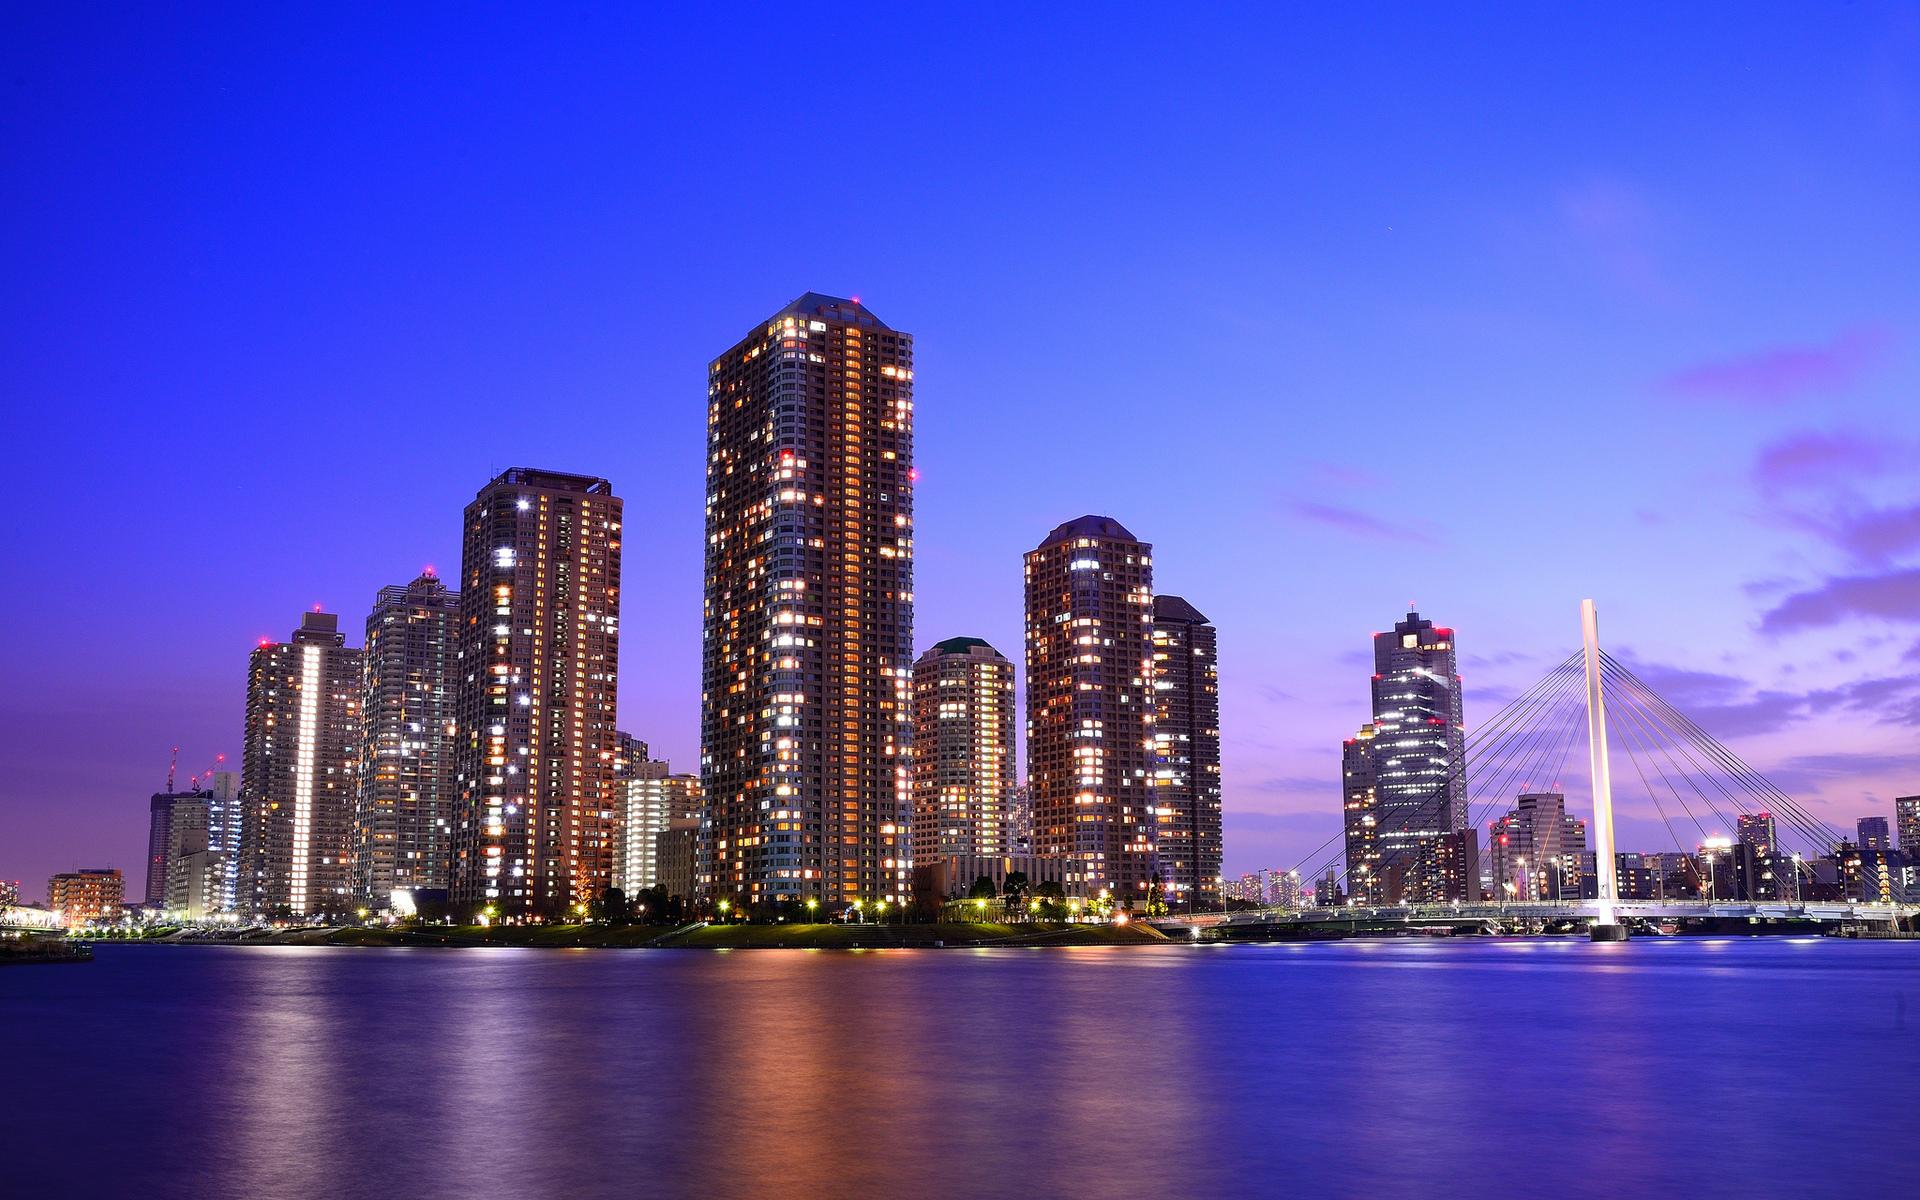 страны архитектура ночь Япония Токио country architecture night Japan Tokyo без смс